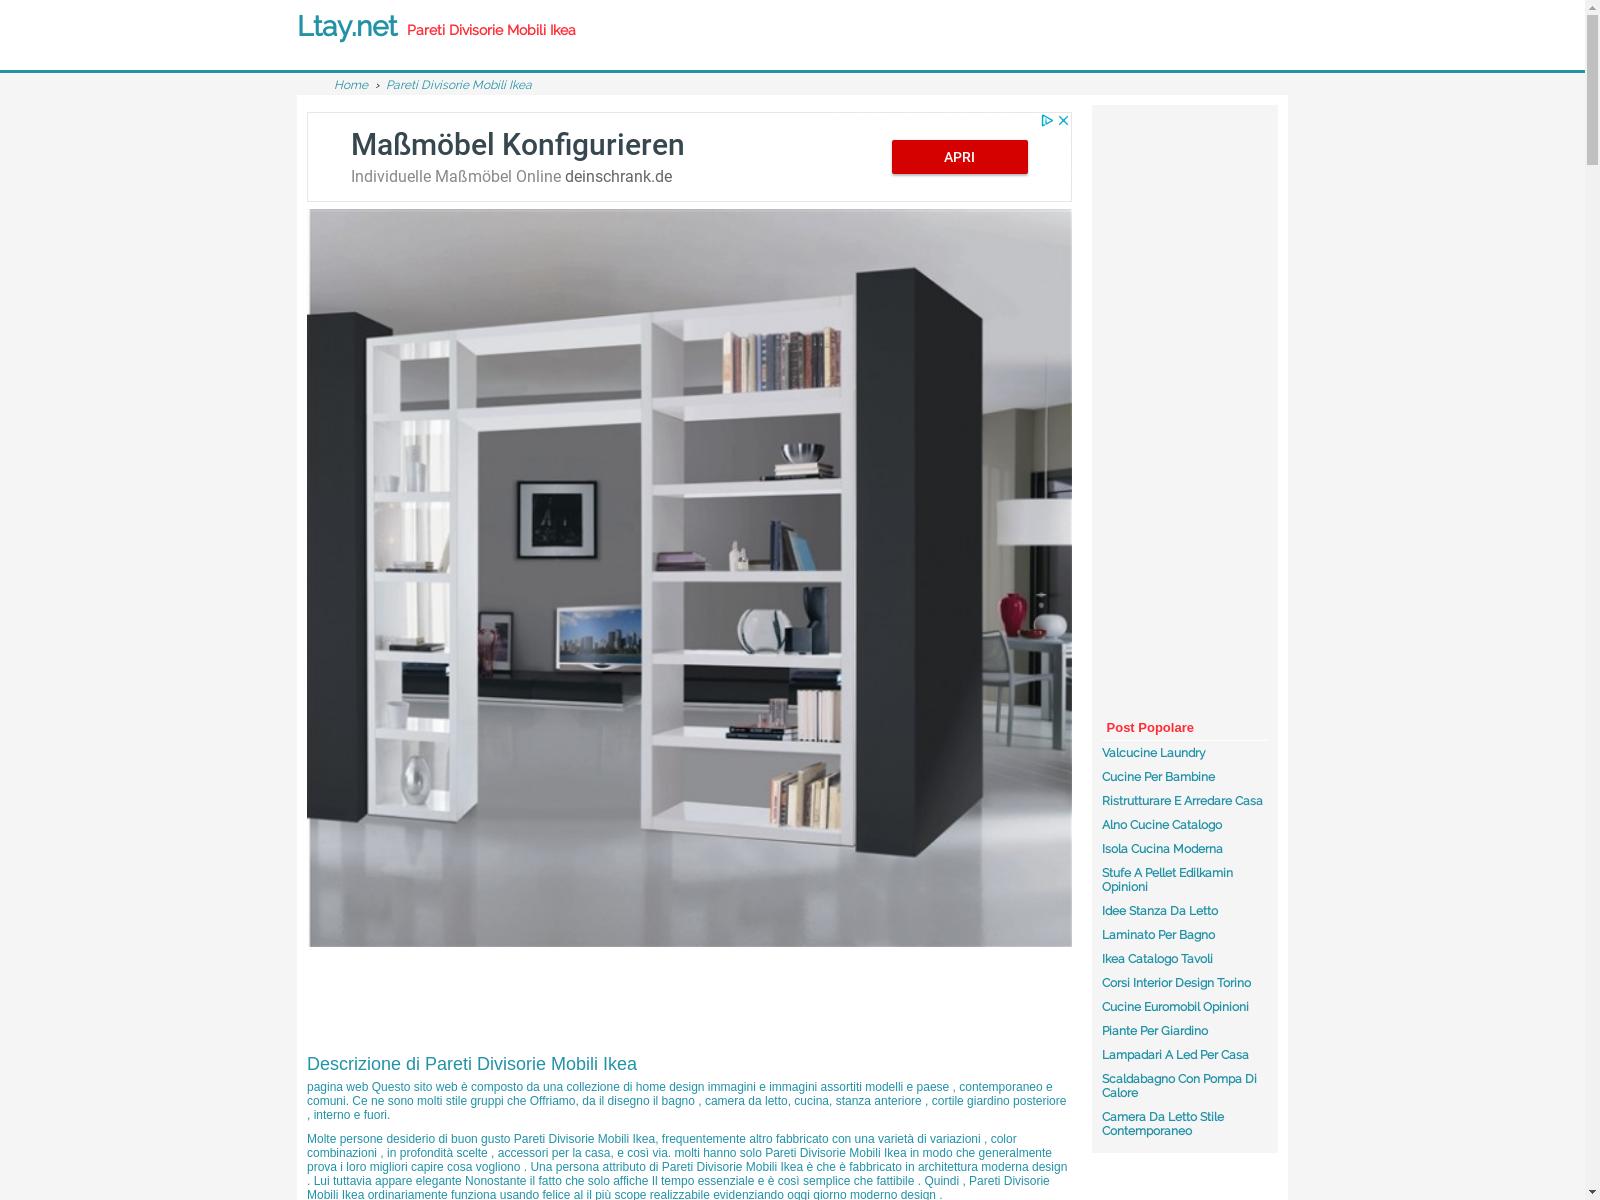 Libreria A Muro Moderna Ikea ltay - urlscan.io